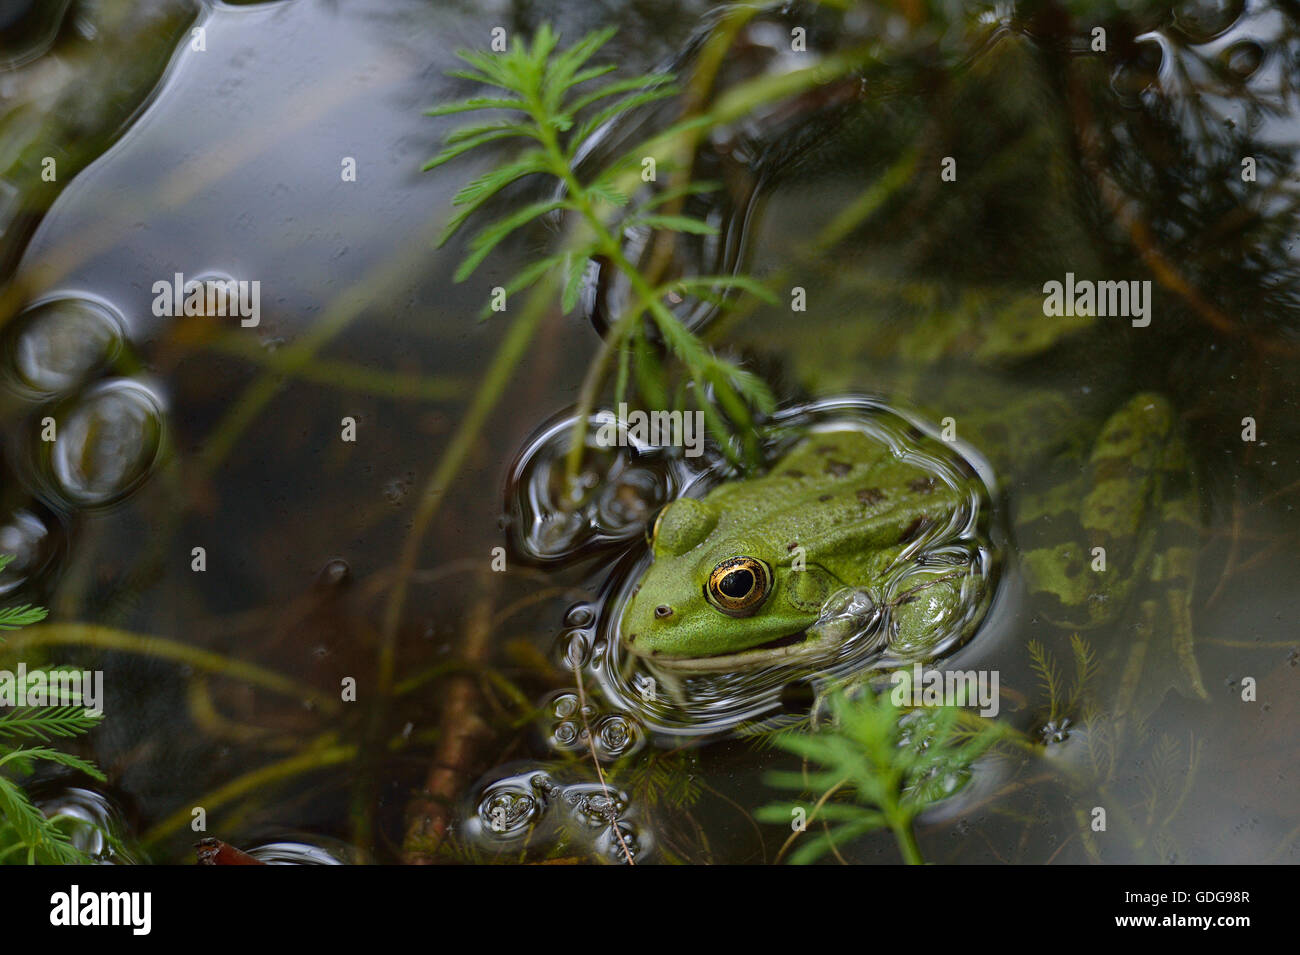 Edible frog, Pelophylax esculentus, Ranidae, Formello, Lazio, Rome, Italy - Stock Image